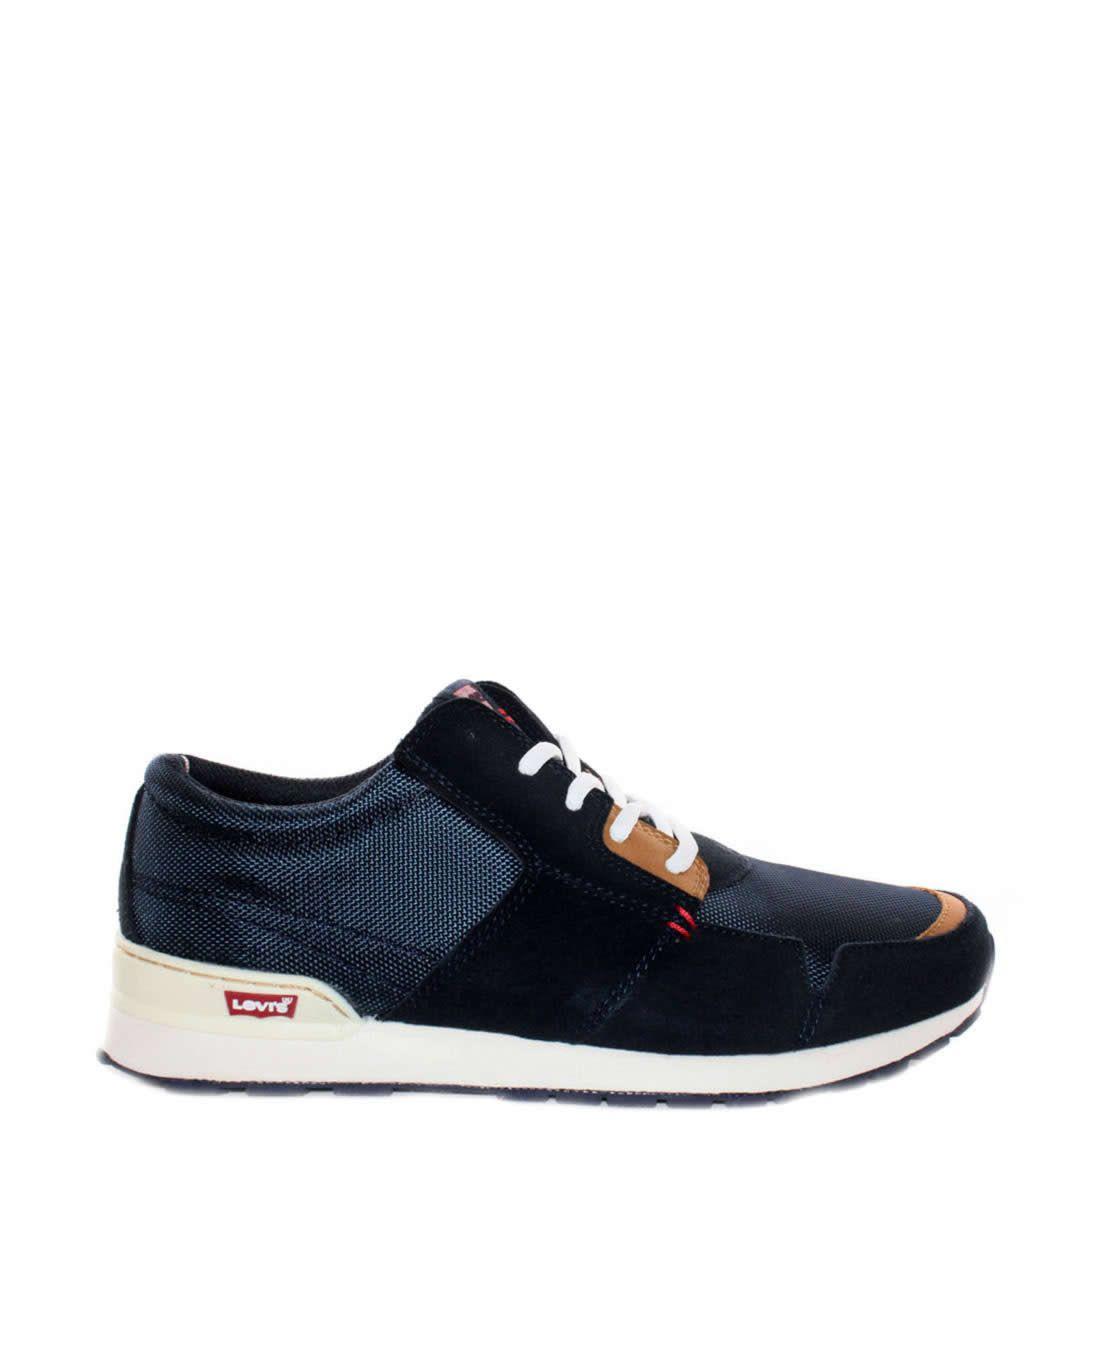 Sneaker Low Levi's 220894 MARINO Schuhe Herren Acquista